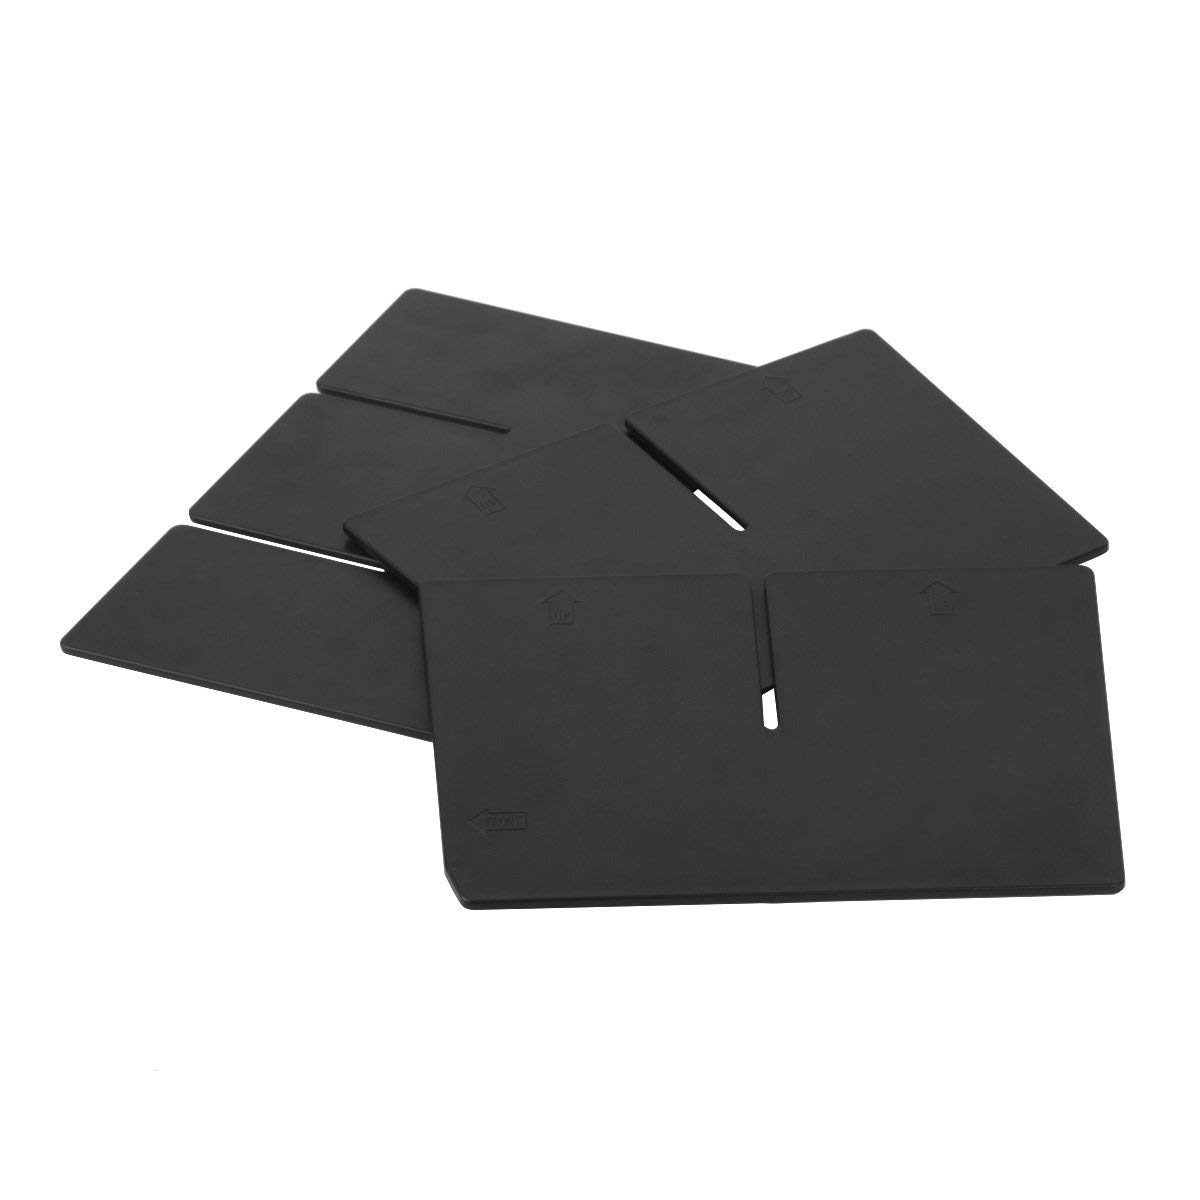 Black JMgist Center Console Organizer Armrest Insert Car Storage Console Organizer for Toyota Tacoma 2016-2019